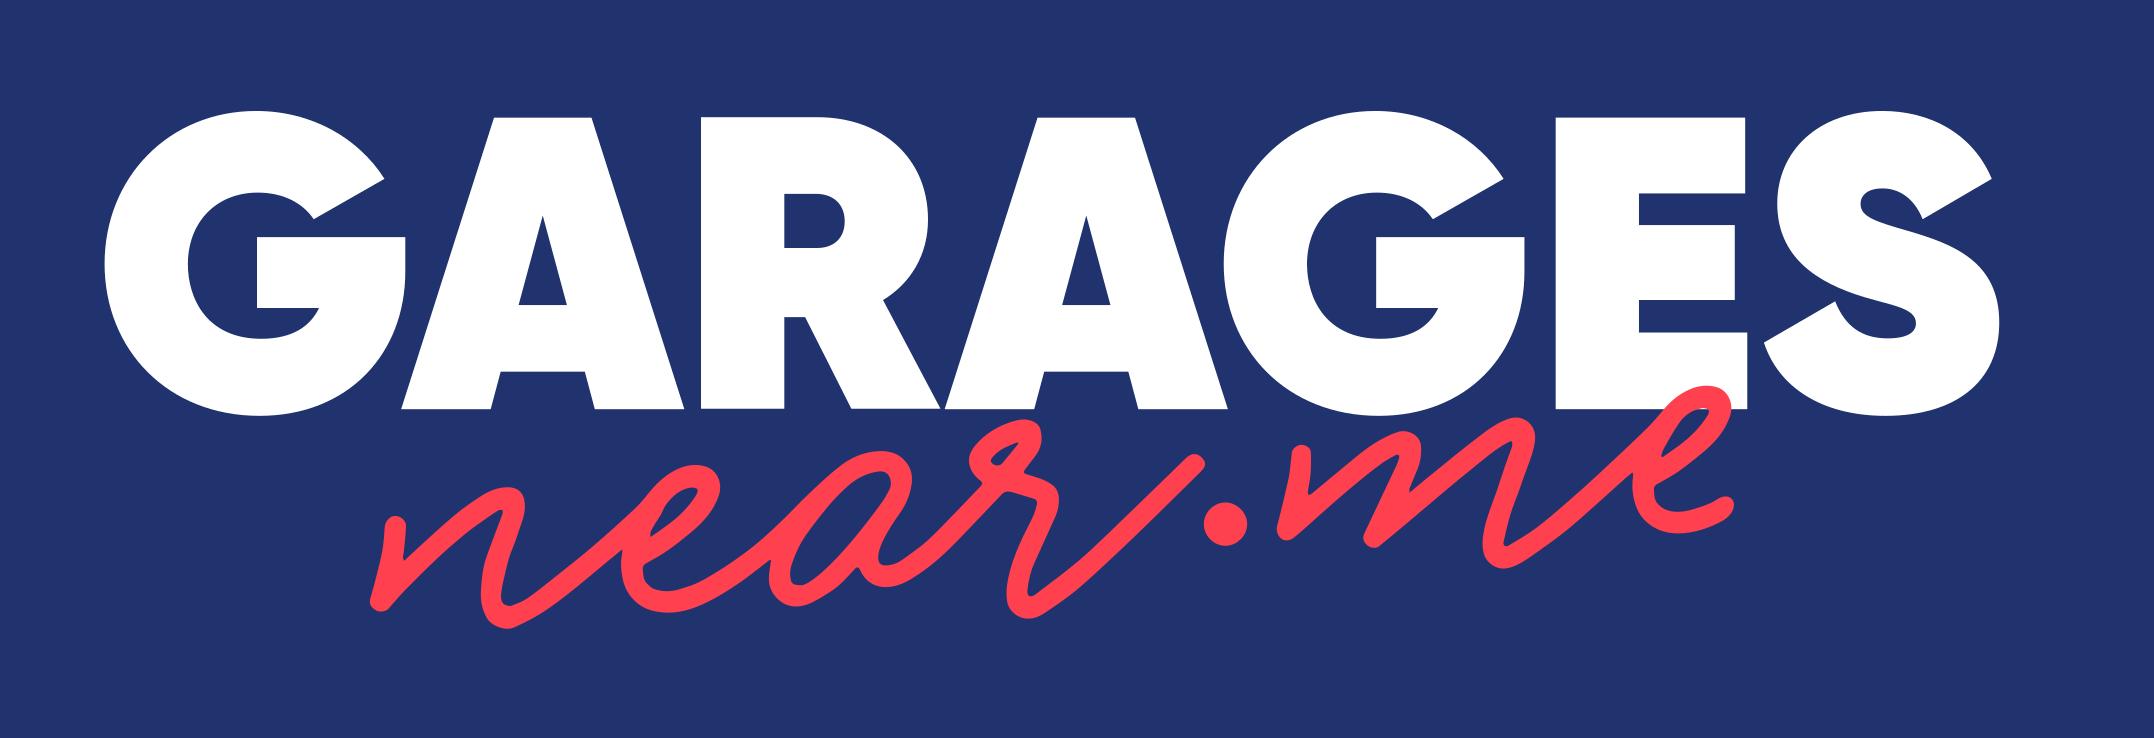 GaragesNear.me logo white